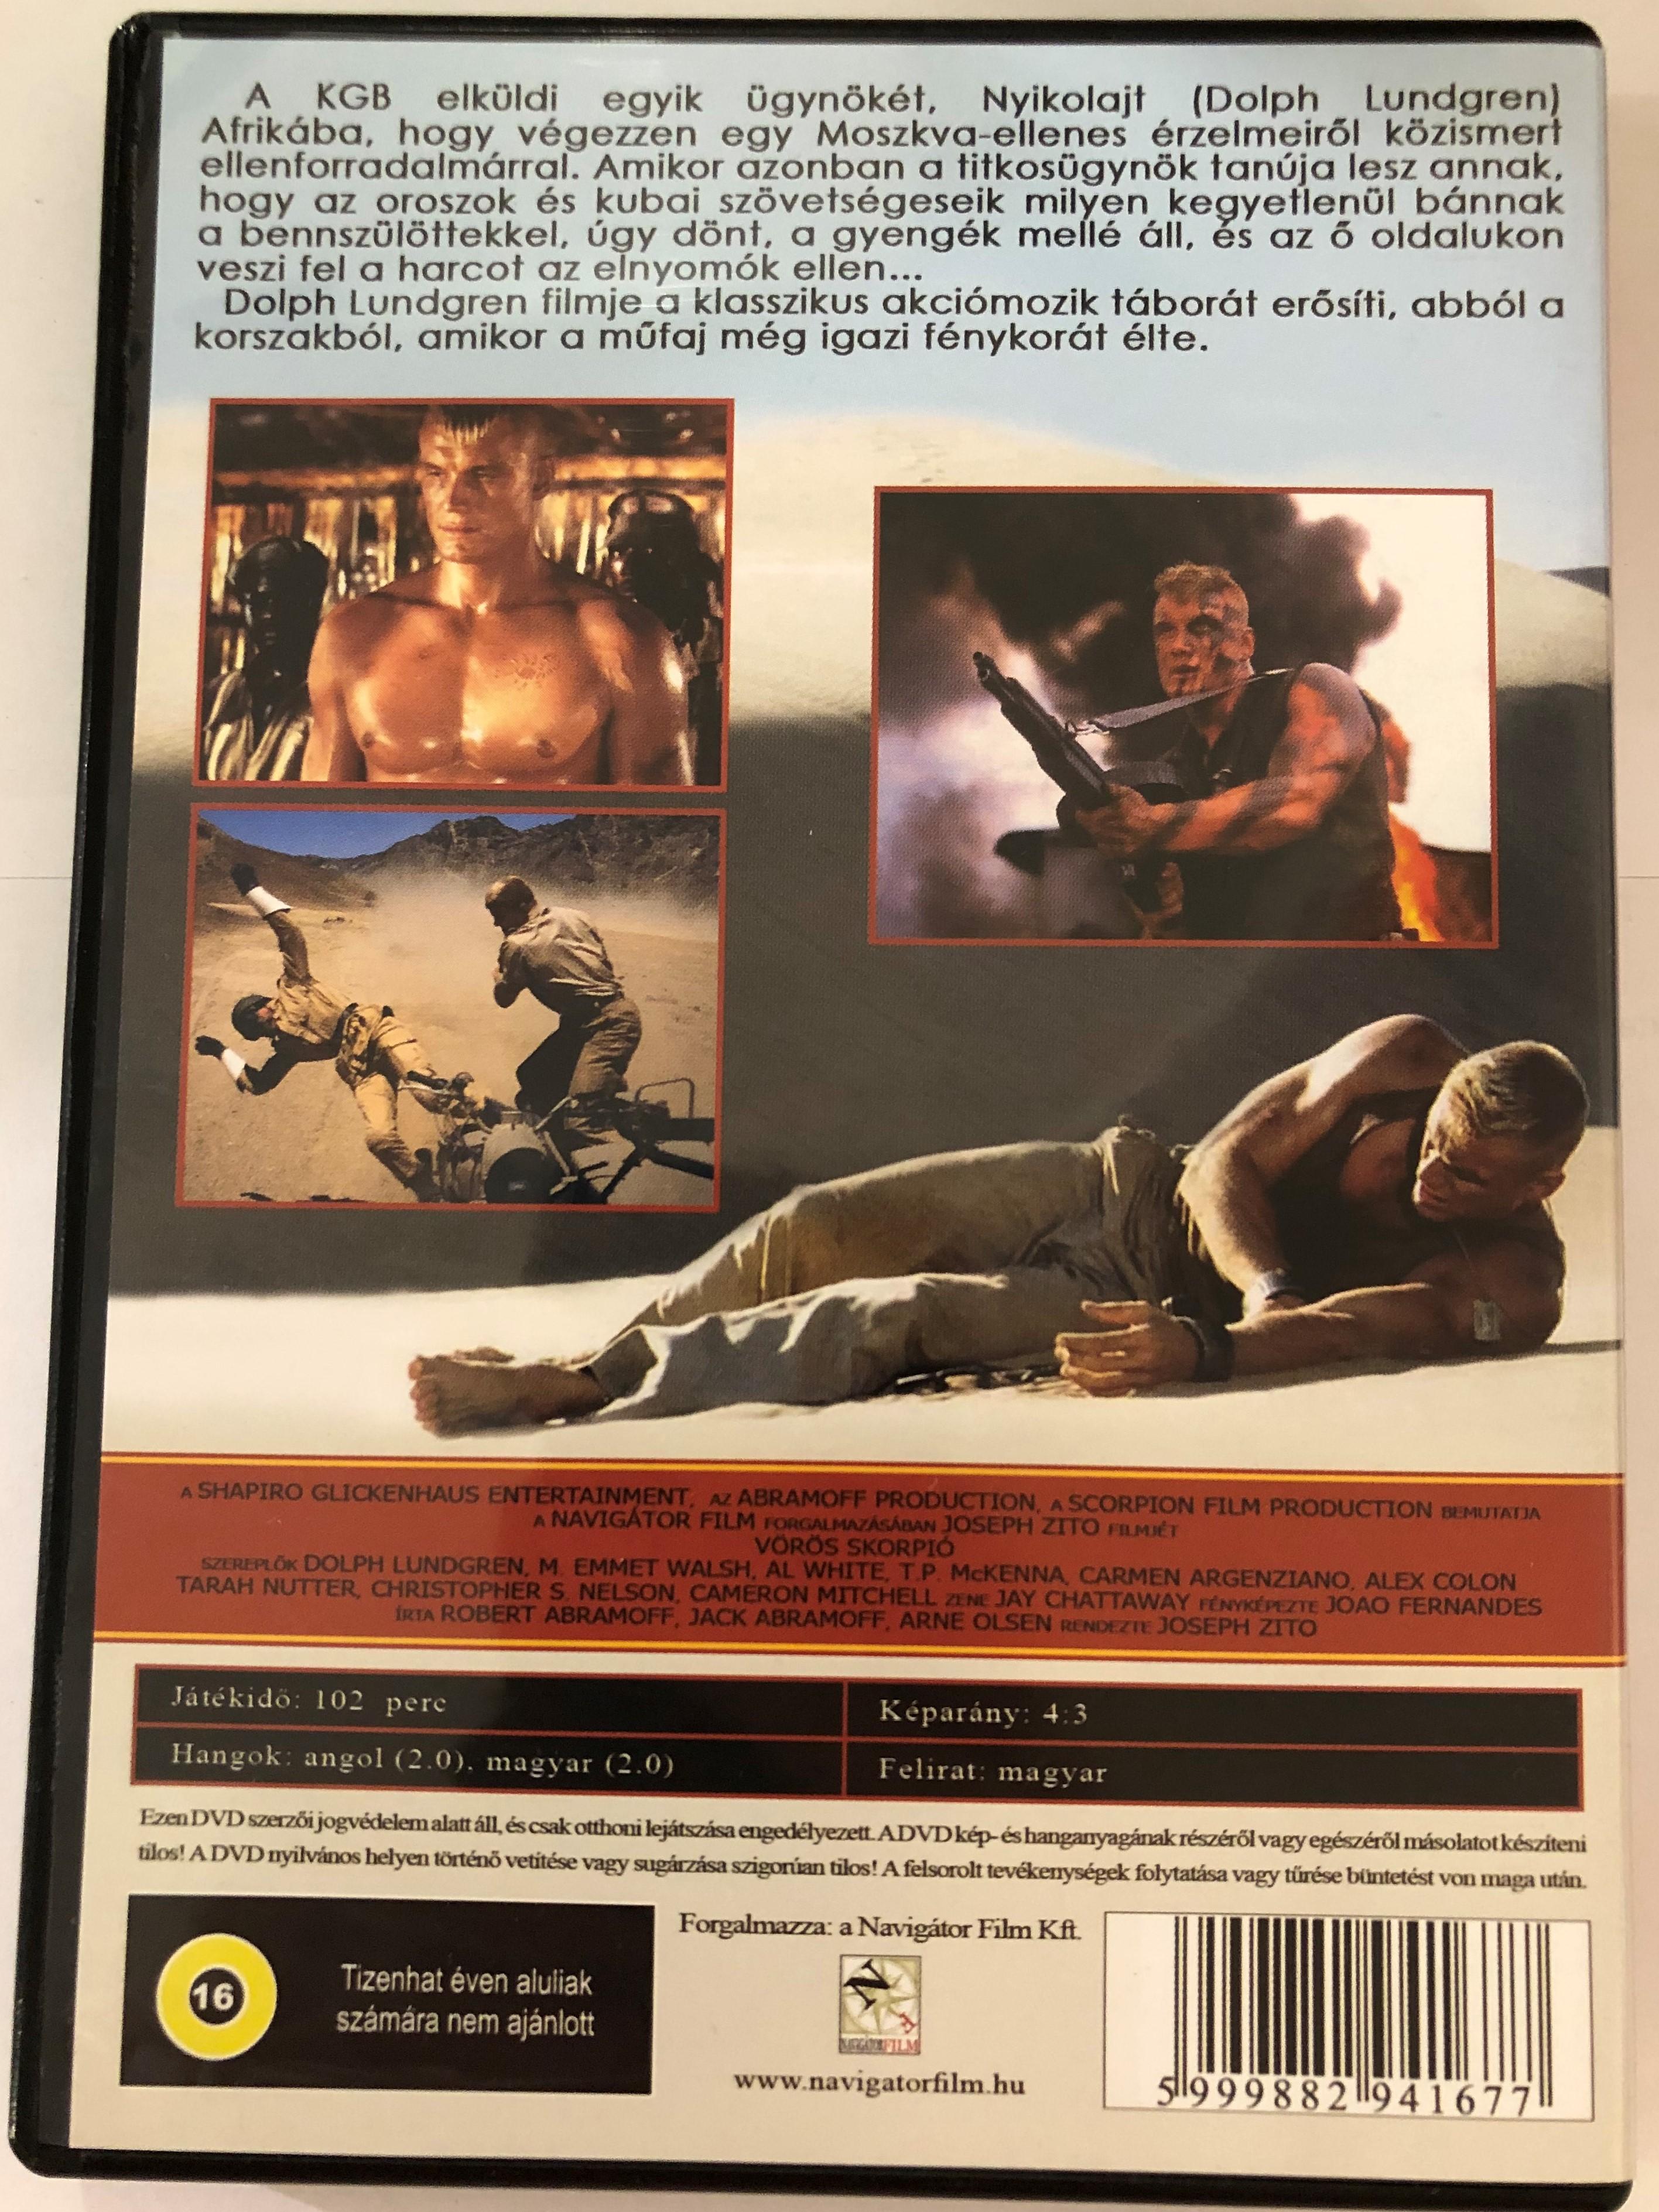 Red Scorpion (1989) Dolph Lundgren Lt. Nikolai Rachenko